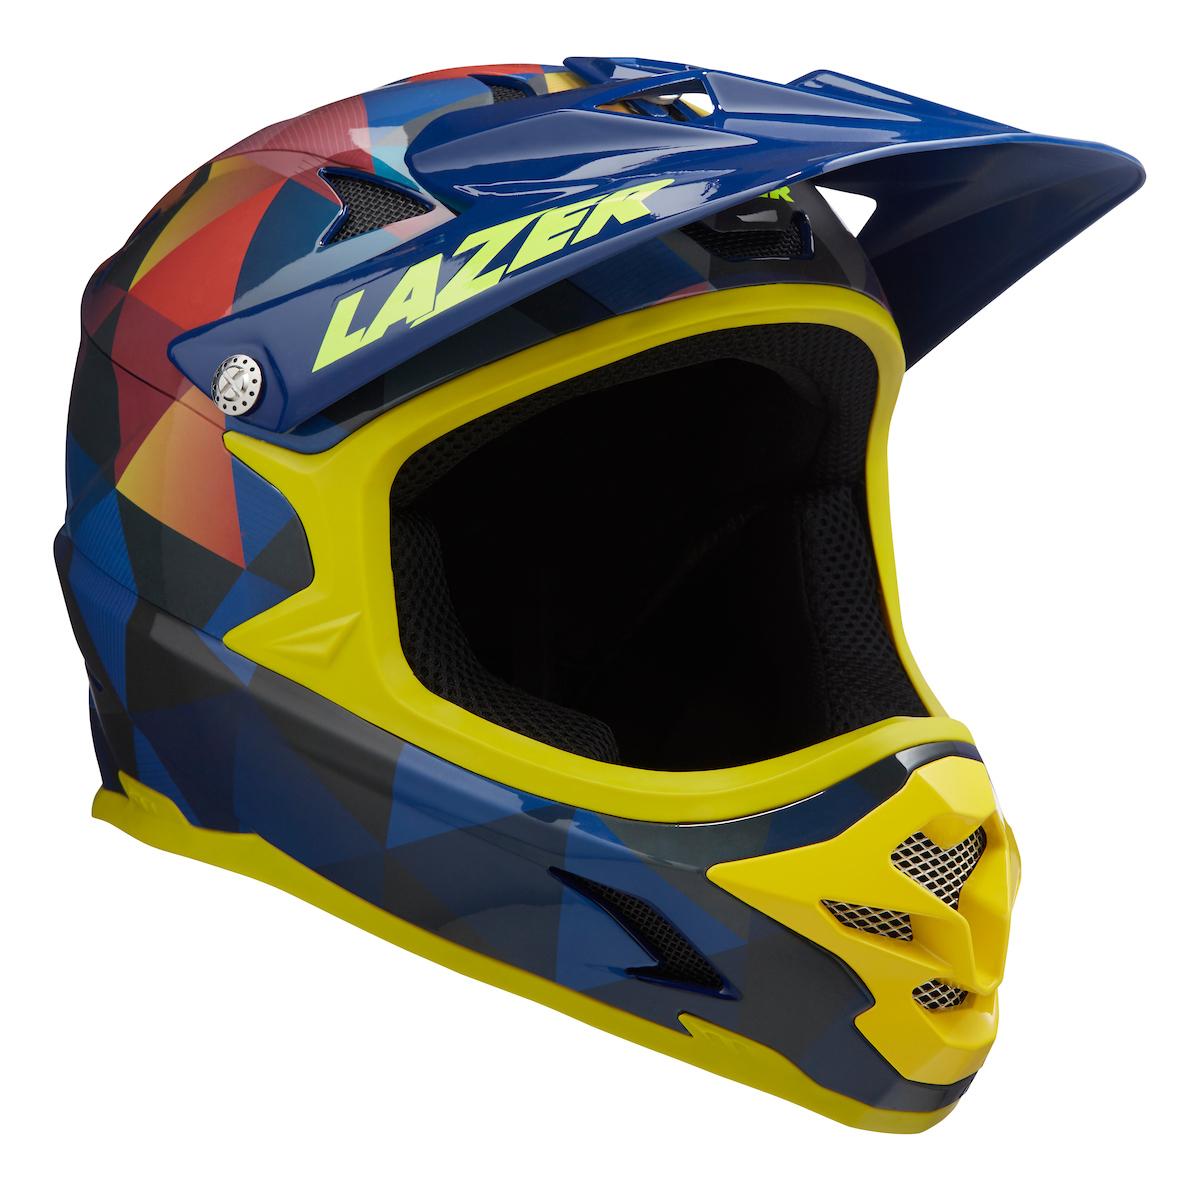 LAZER přilba Phoenix+ CE/ žluto modrá TRIANGLES M